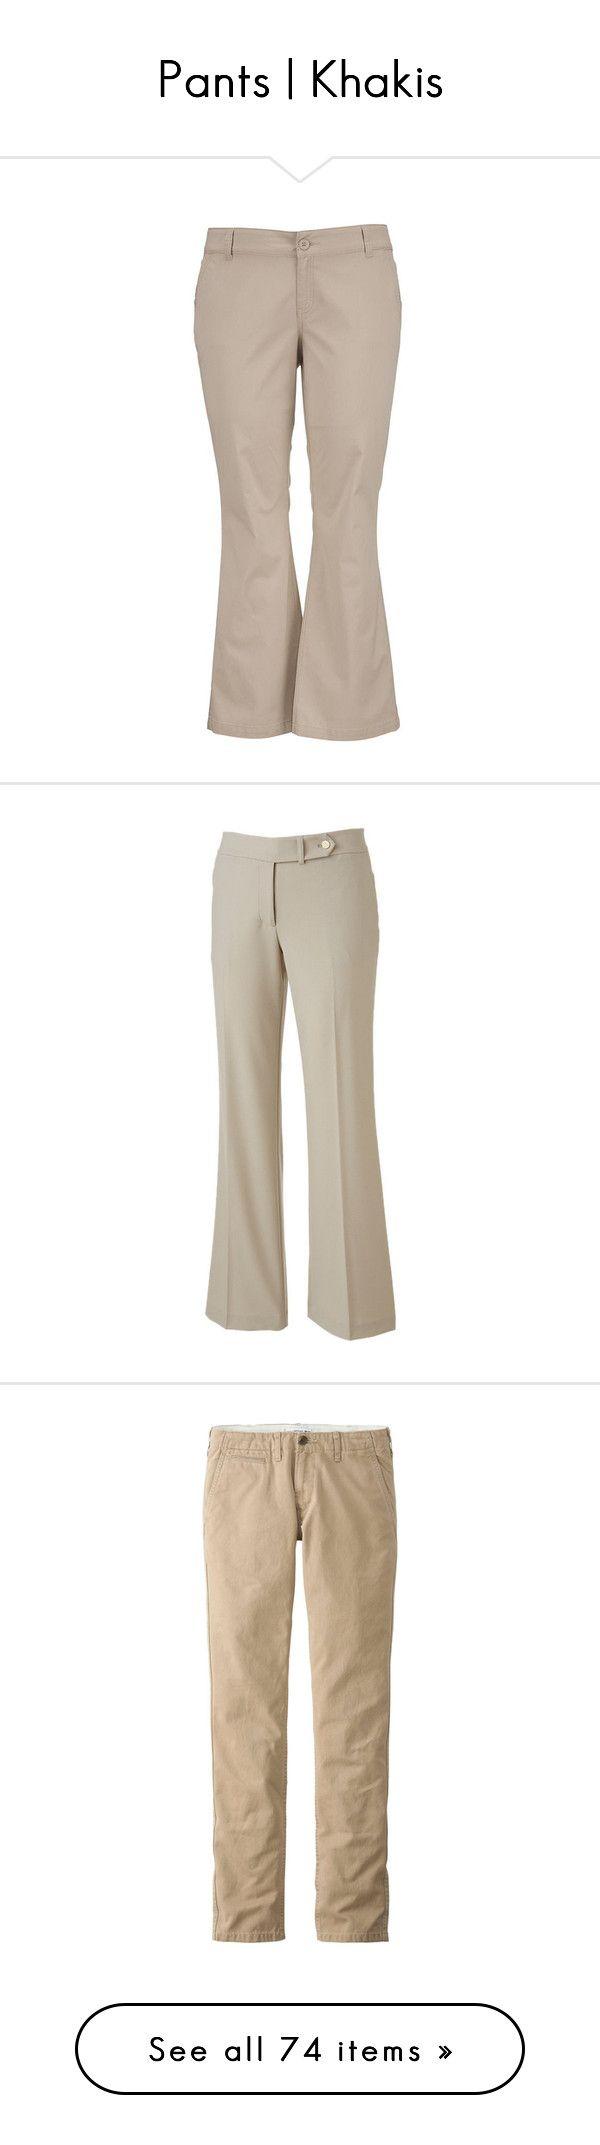 """Pants | Khakis"" by christinagleason ❤ liked on Polyvore featuring pants, womens plus size khaki pants, khaki pants, plus size trousers, wide pants, brown chino pants, khaki, zipper pocket pants, zip pocket pants and straight leg trousers"